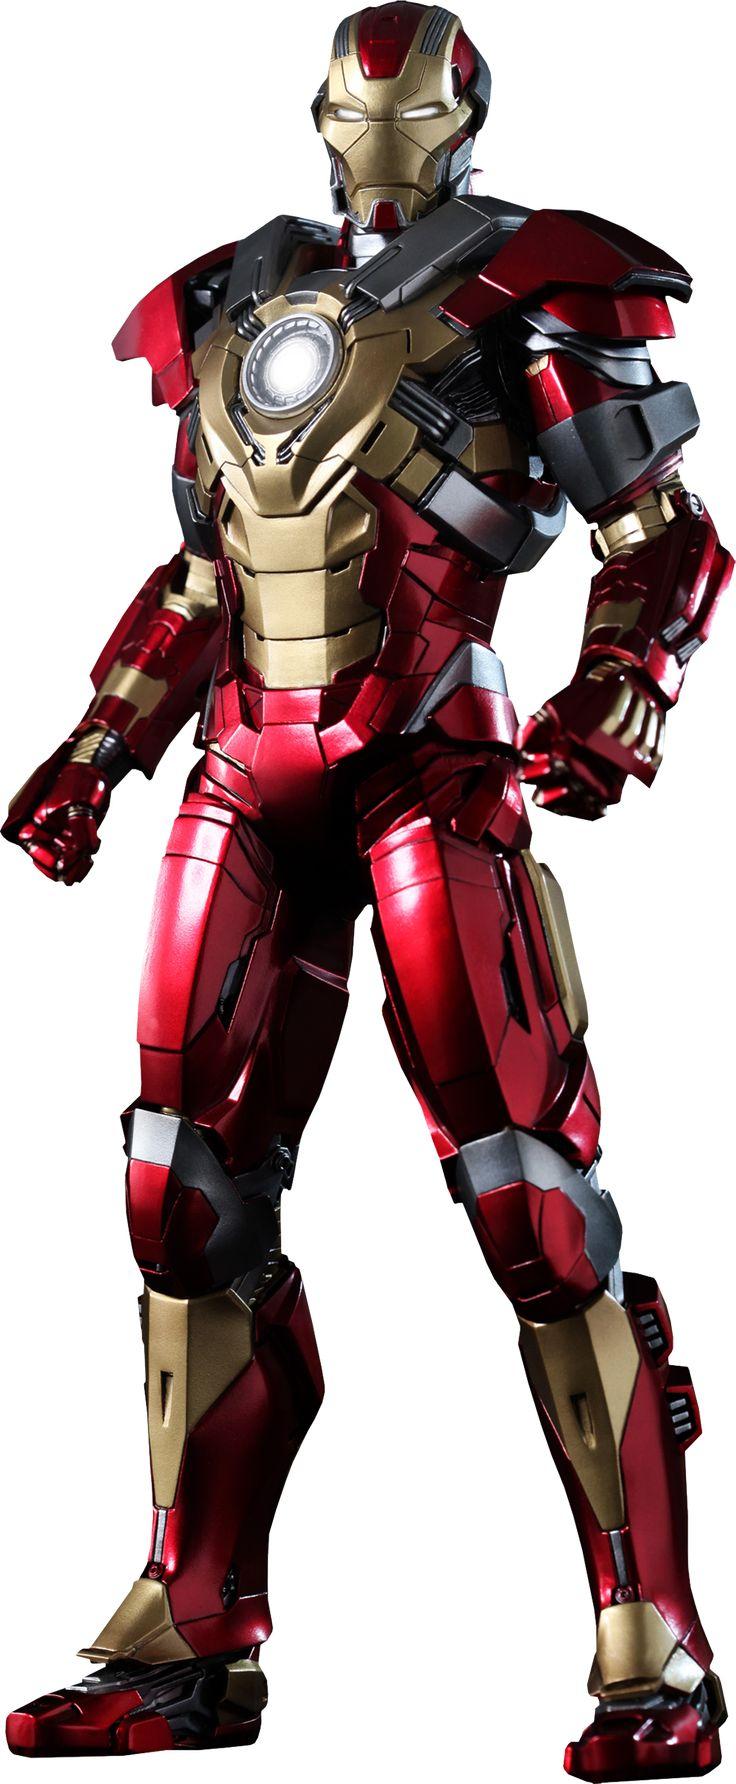 Pin by yaomorn on iron man pinterest iron man marvel - Iron man 1 images ...